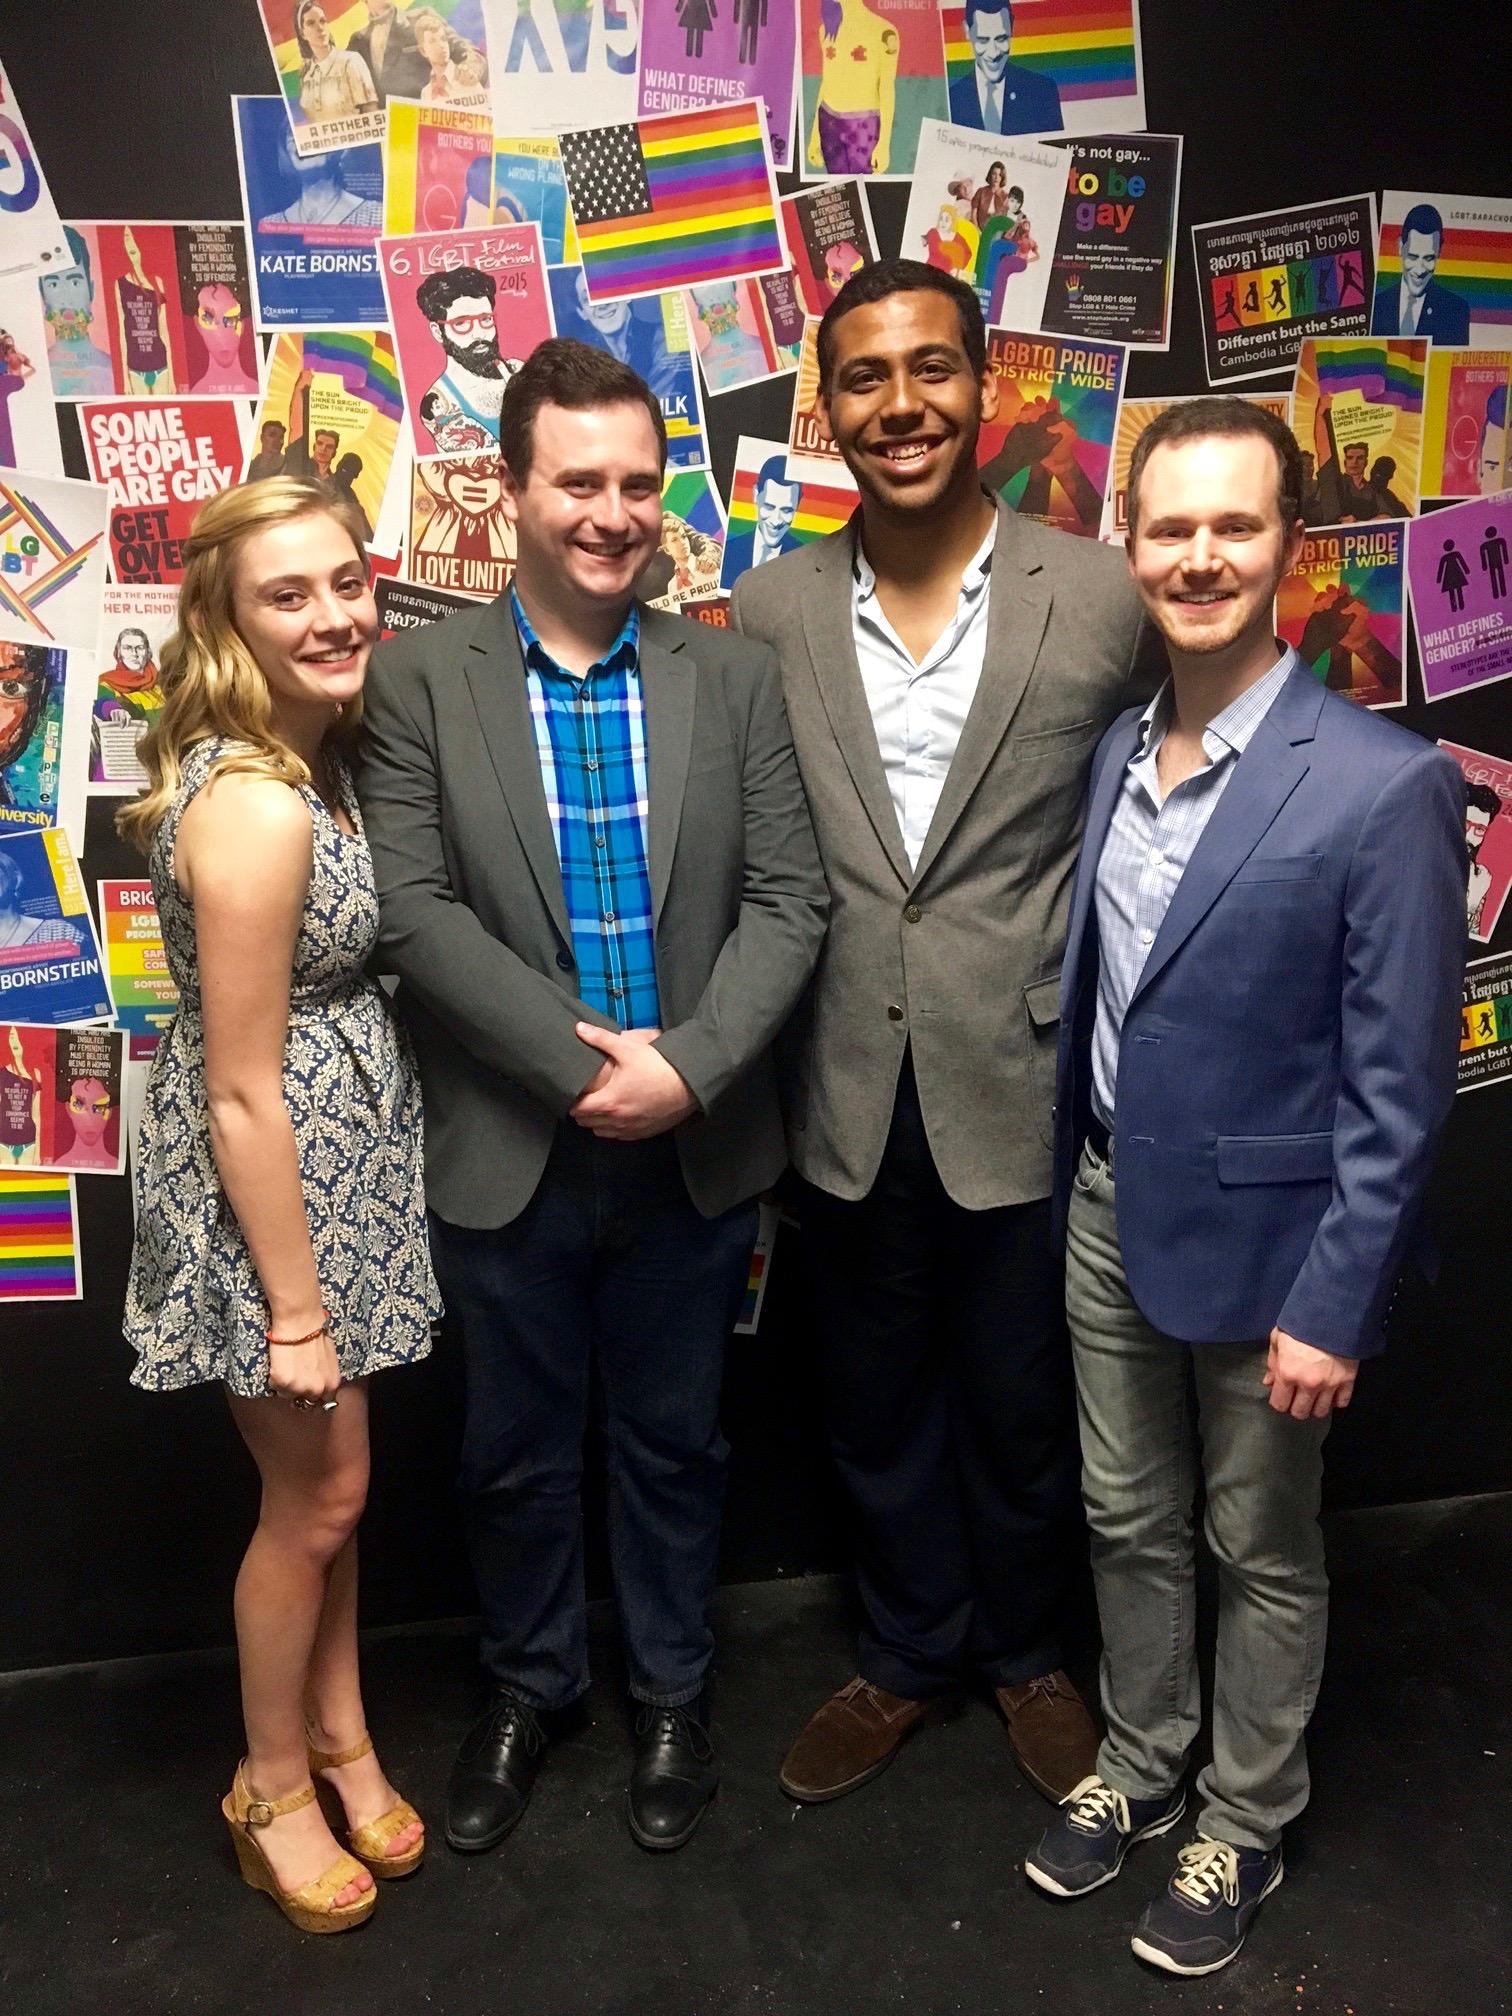 Addison Brown (assistant director), Jonathan Keebler (lyricist/bookwriter), Clyde Moser (director), Ryan Korell (composer)